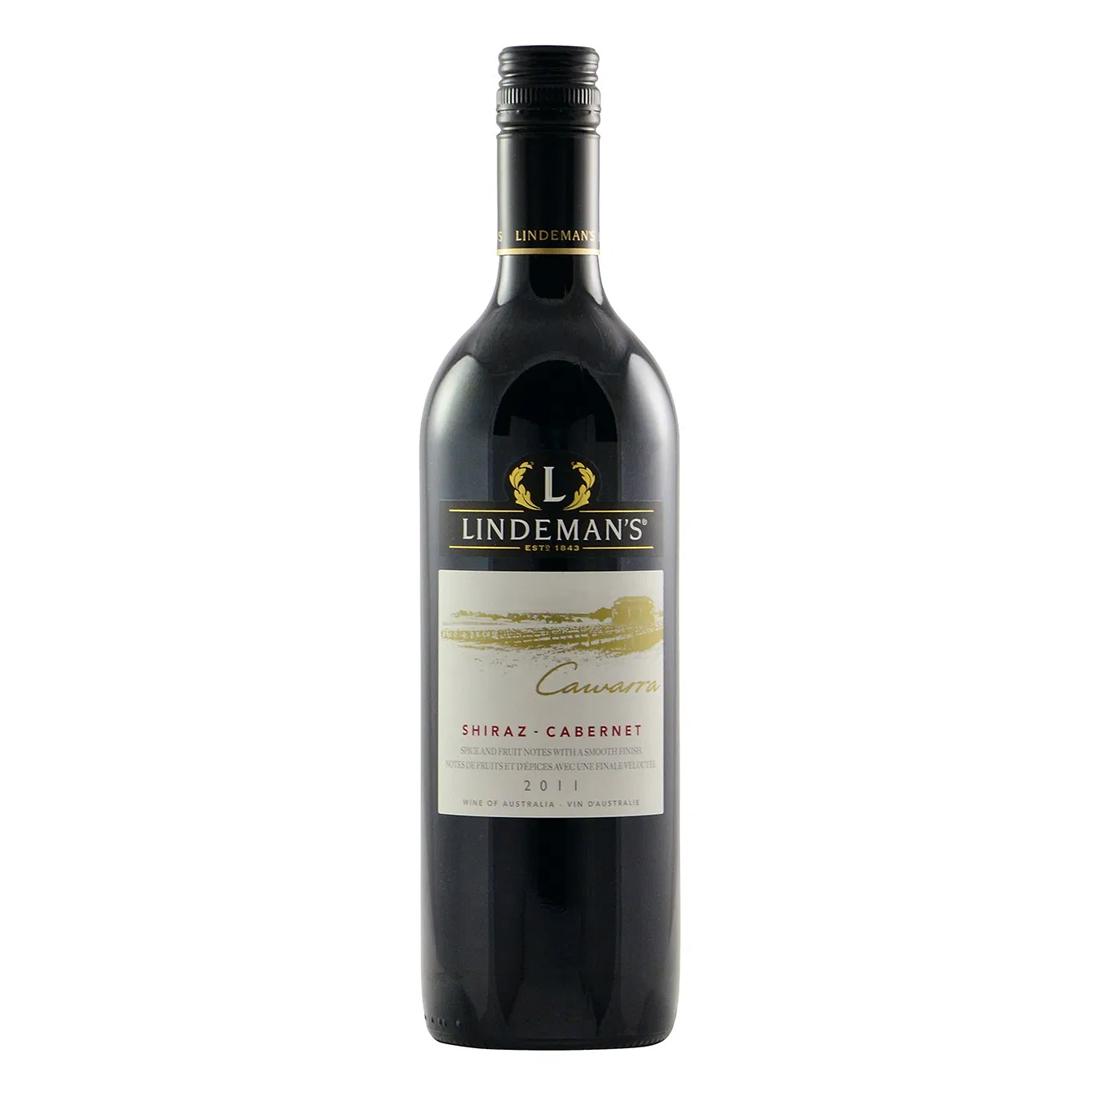 Vinho Lindemans Cawarra Shiraz - Cabernet 750 ml